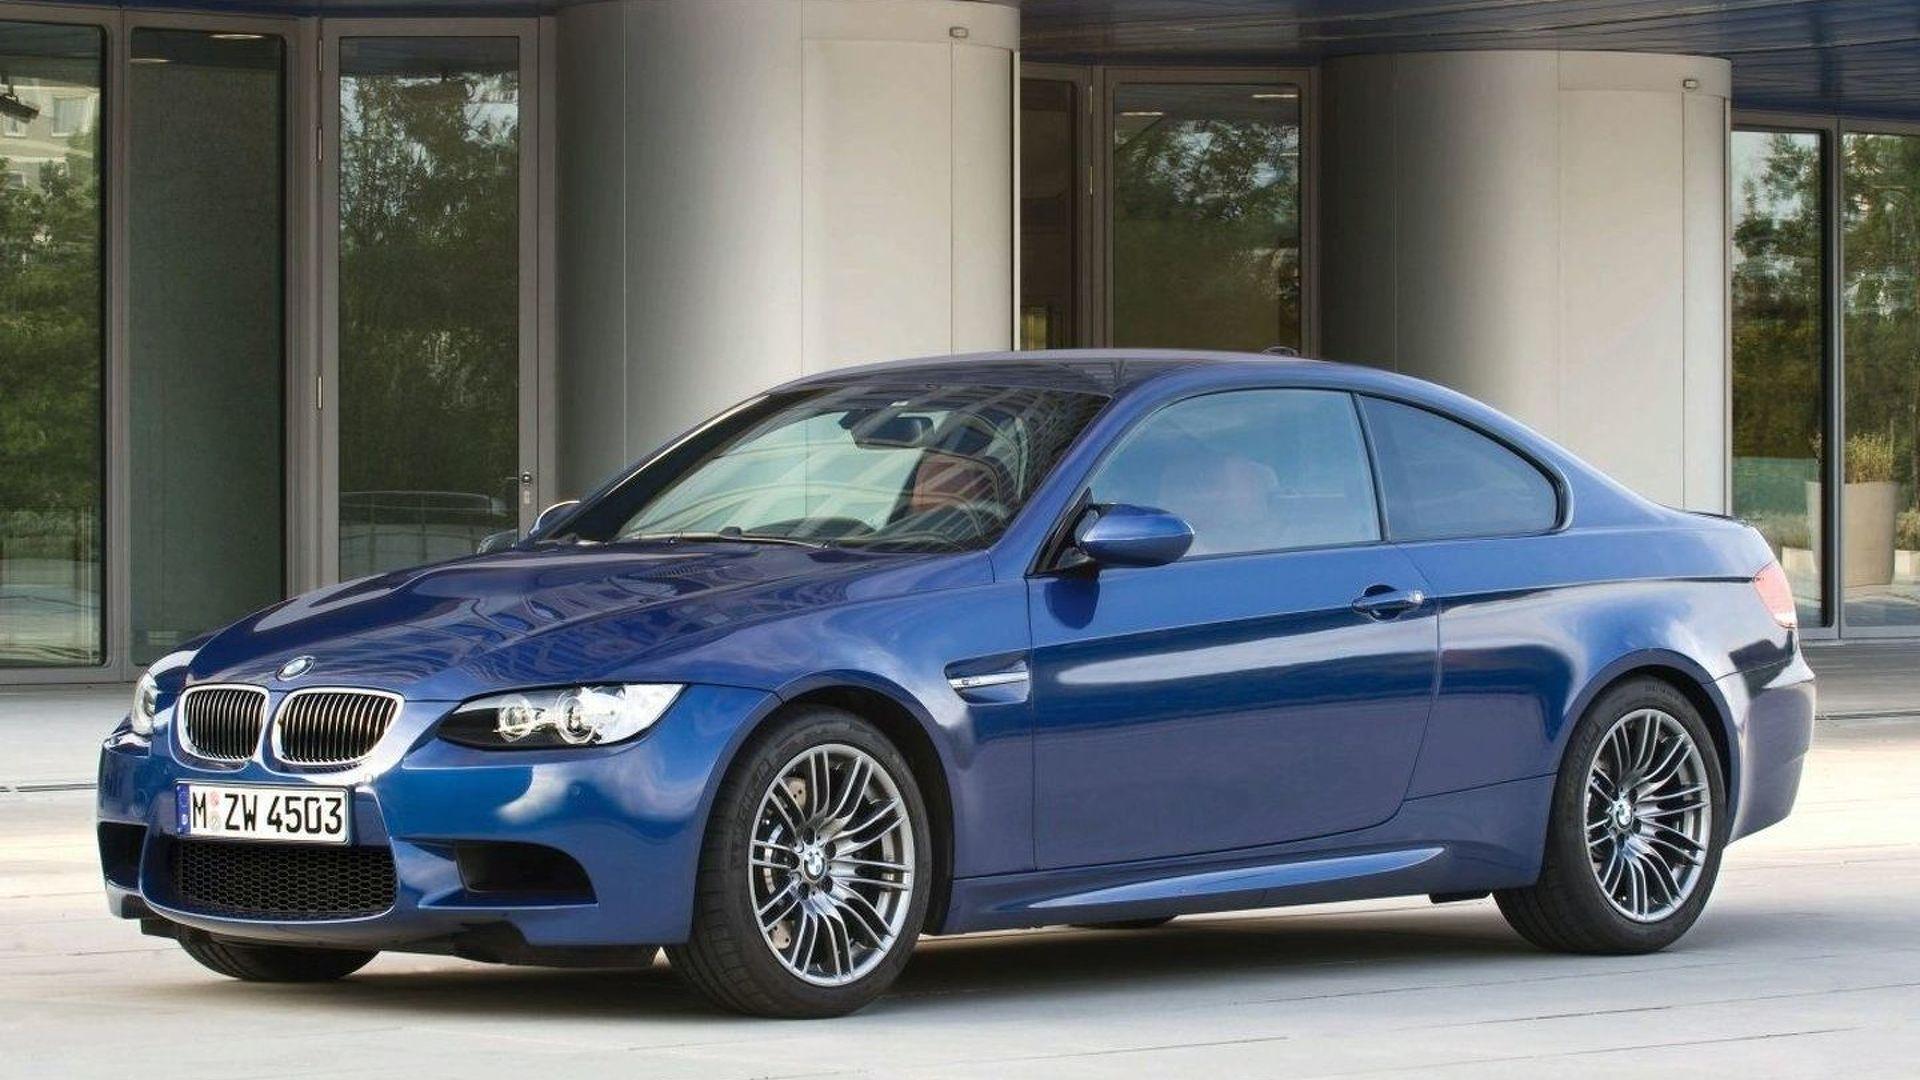 2009 BMW M3 Sedan Updates